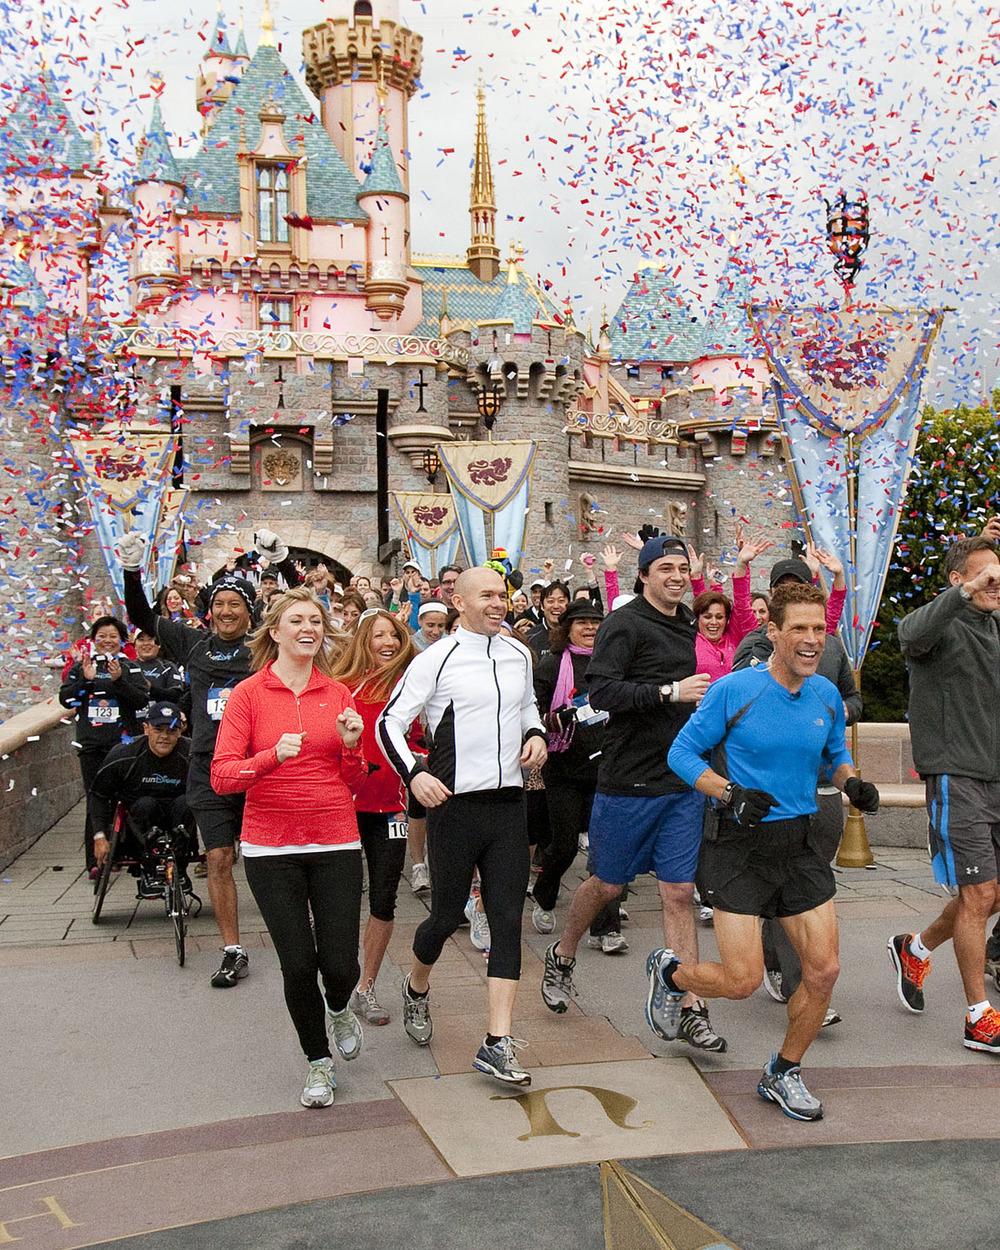 The kickoff from Disneyland, Feb. 25, 2011.